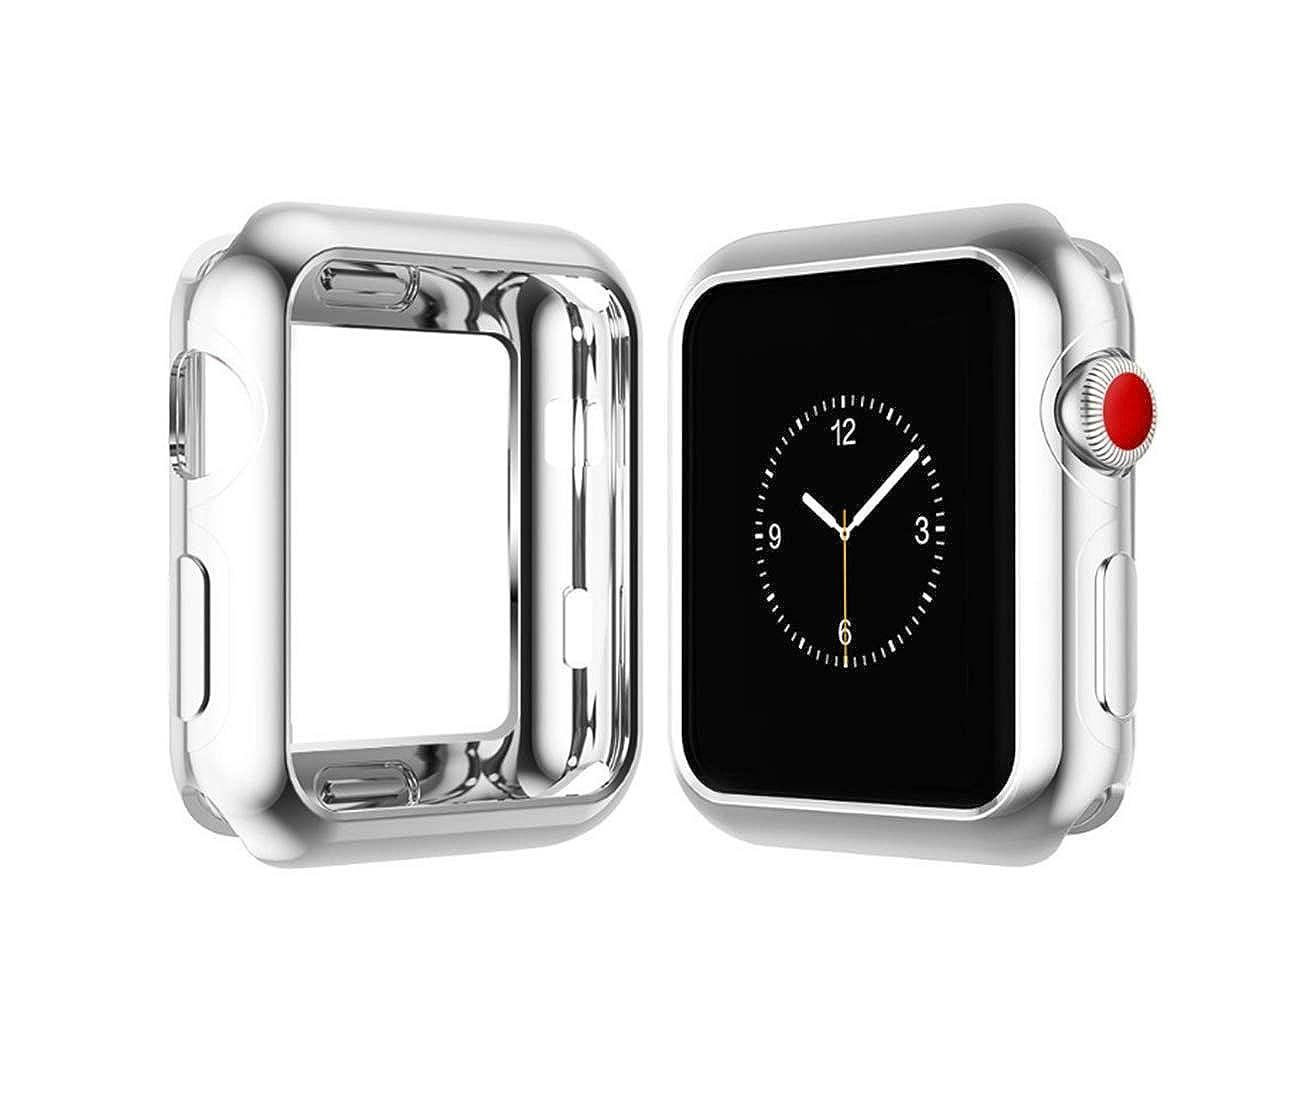 2Buyshop PANTS ボーイズ B07JYNX4C4 シルバー Apple Watch シルバー 4 ボーイズ 40mm PANTS Apple Watch 4 40mm|シルバー, 子供靴&インポートウェアFabrica:3c36cd26 --- krianta.com